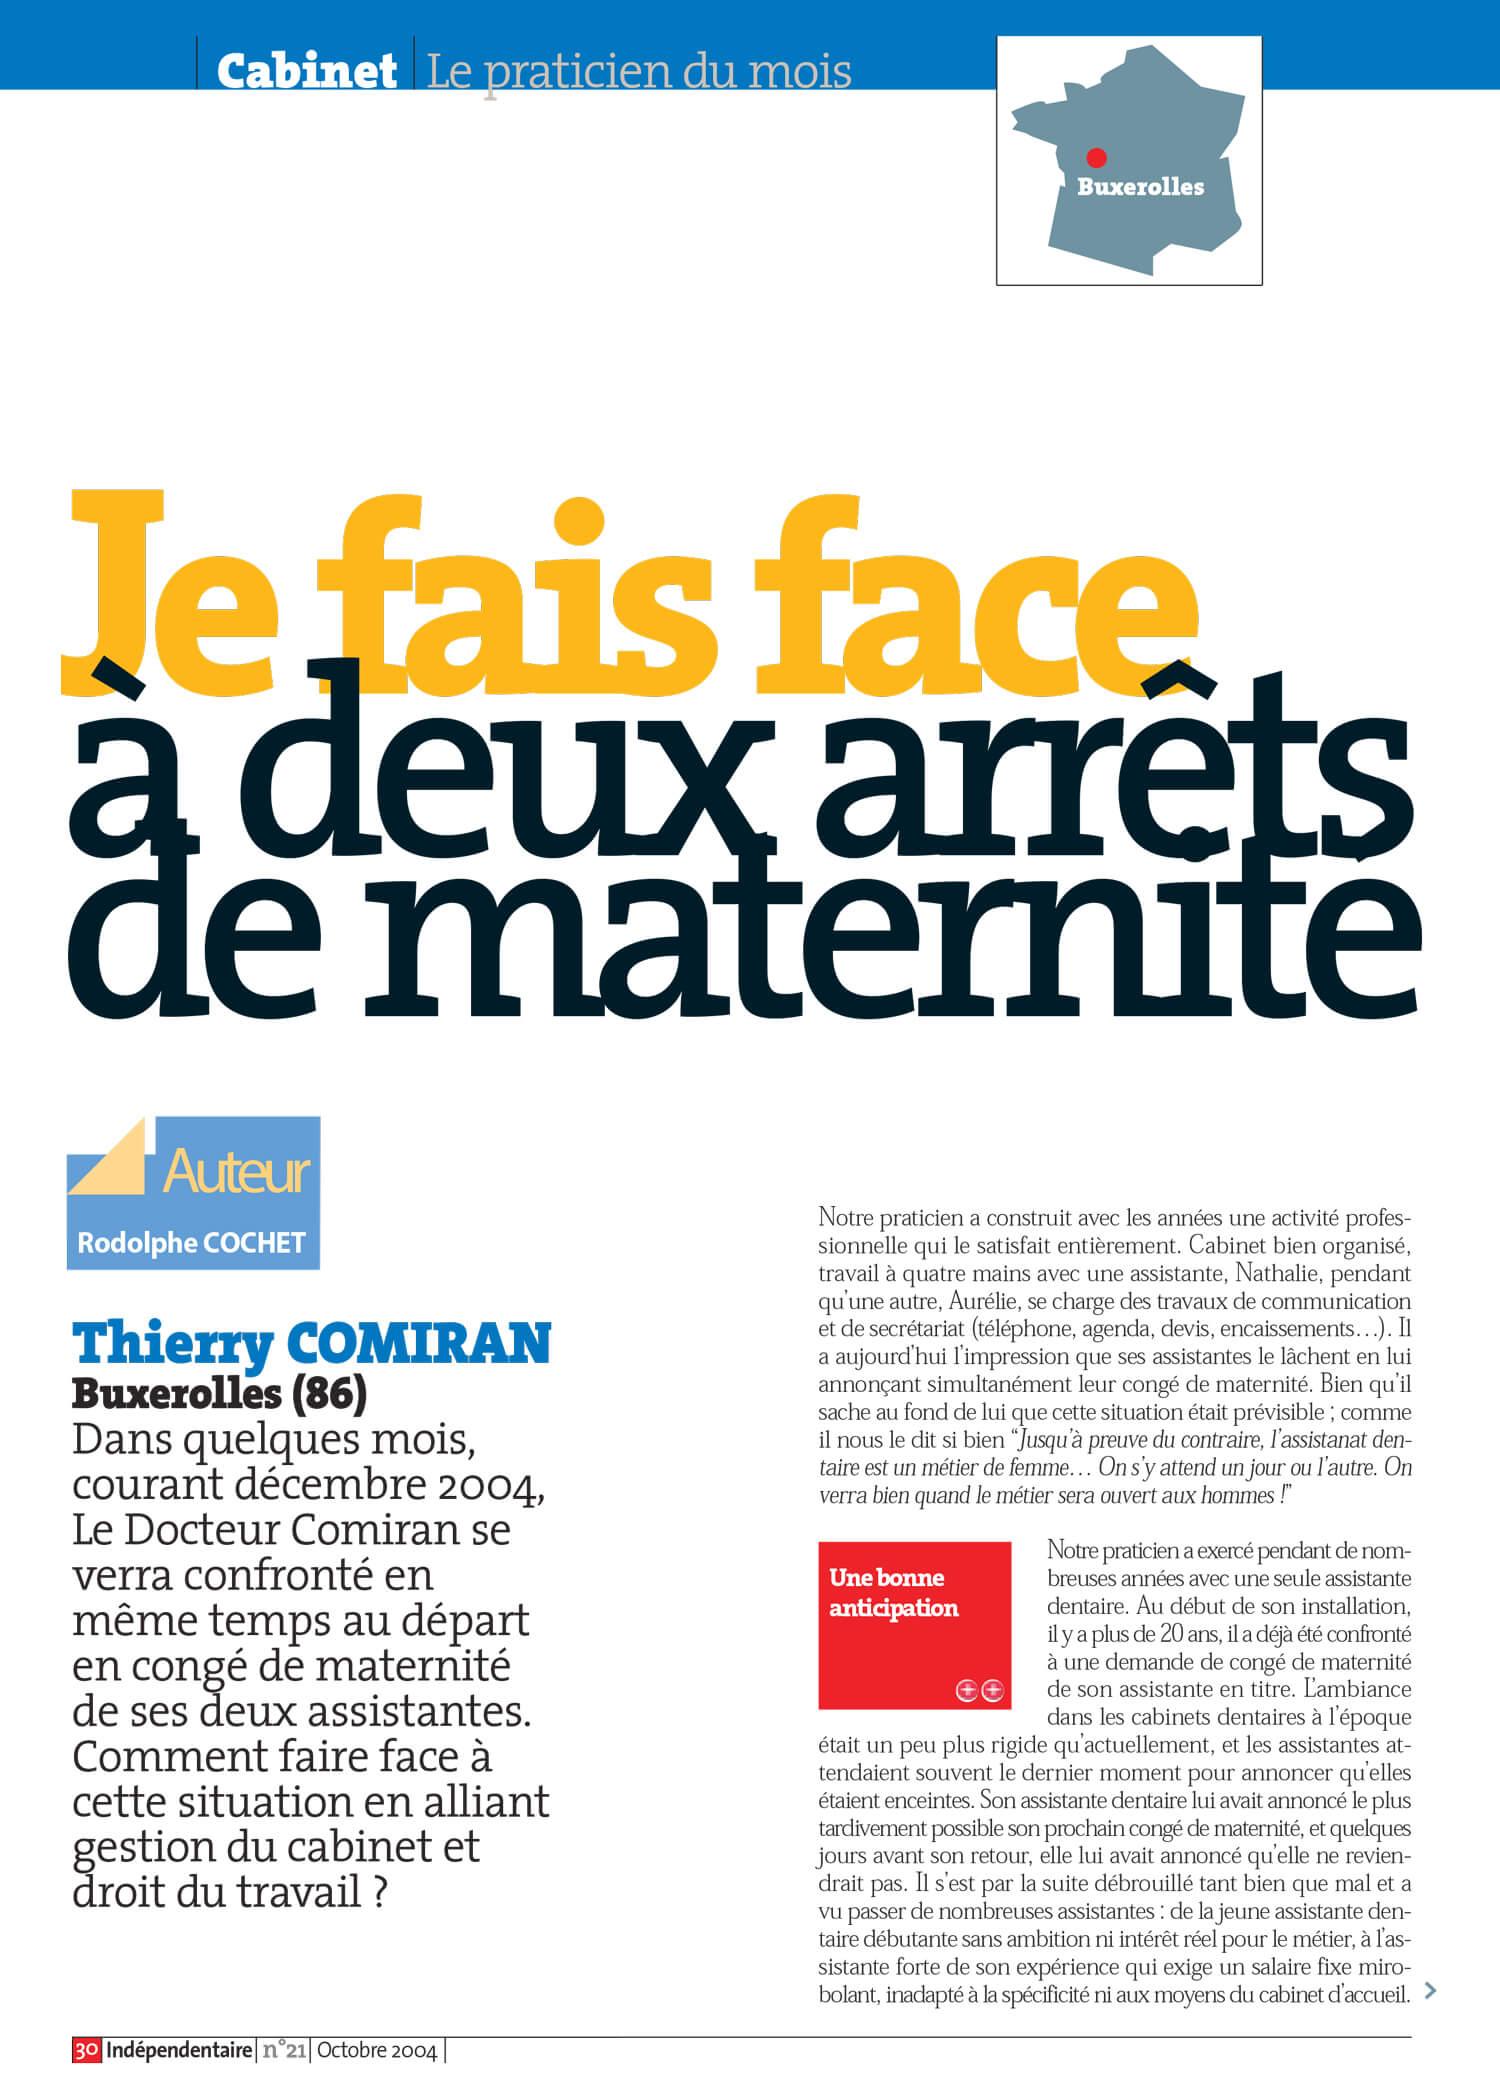 Independentaire_-_Conges_de_maternite_en_cabinet_dentaire_-_Rodolphe_Cochet.jpg